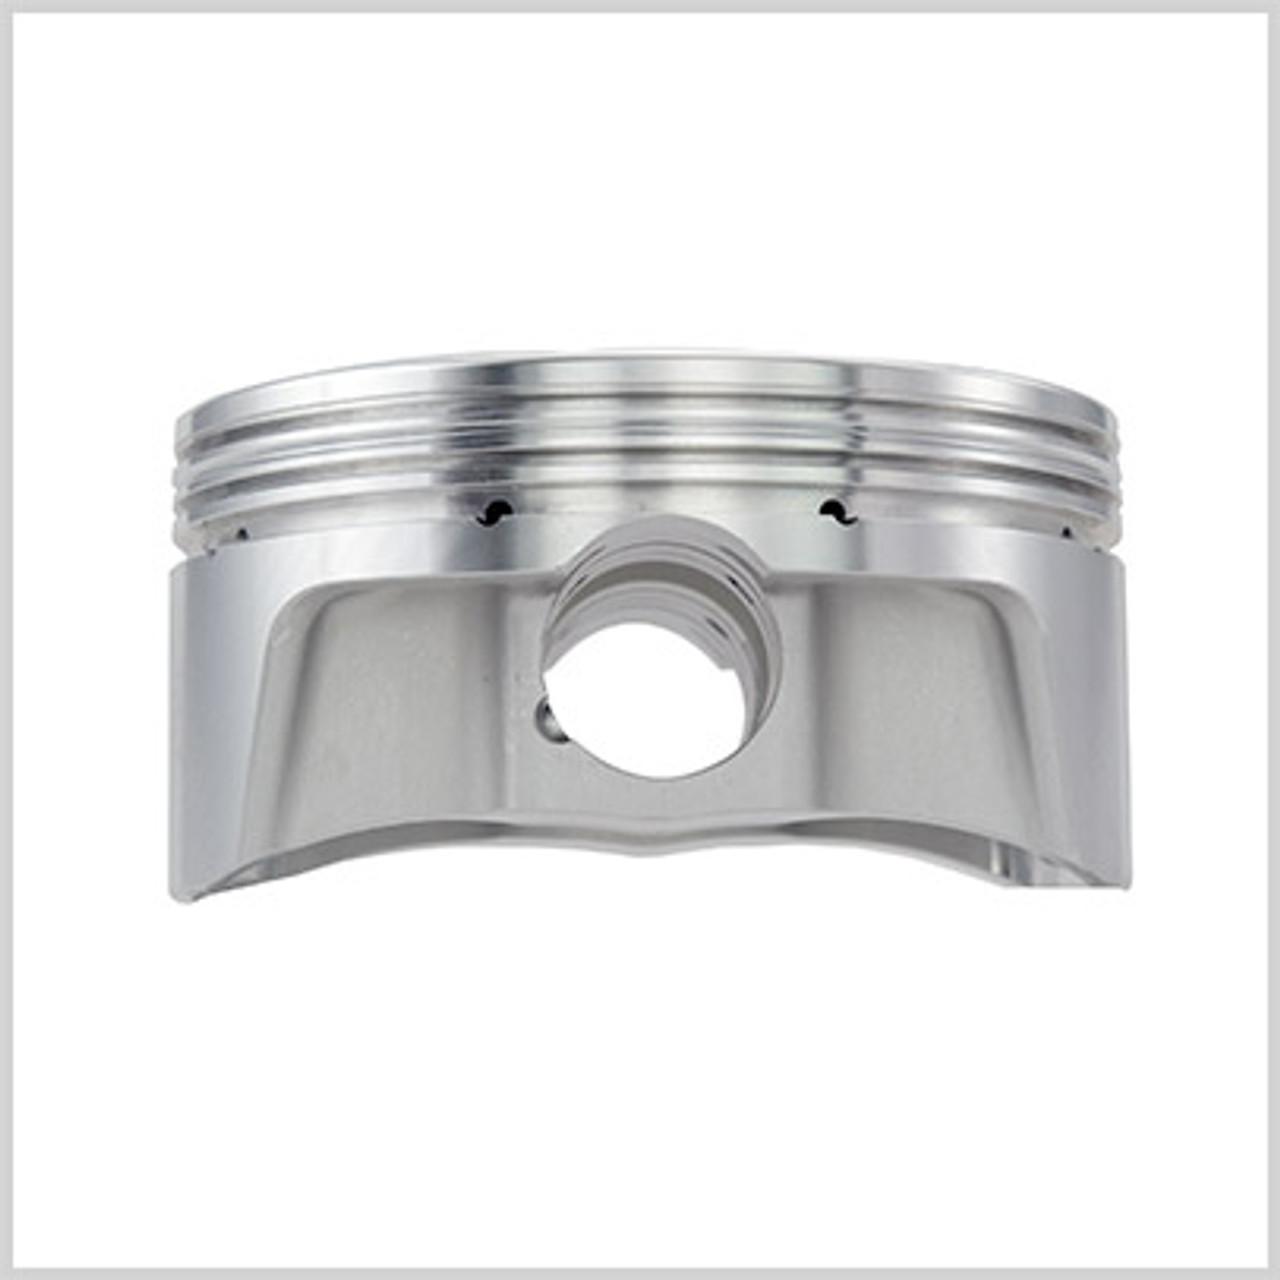 "Carillo CP Bullet LS 4.040"" Pistons Set | 3.622"" Stroke -13cc Dish Top | POWER ADDER"